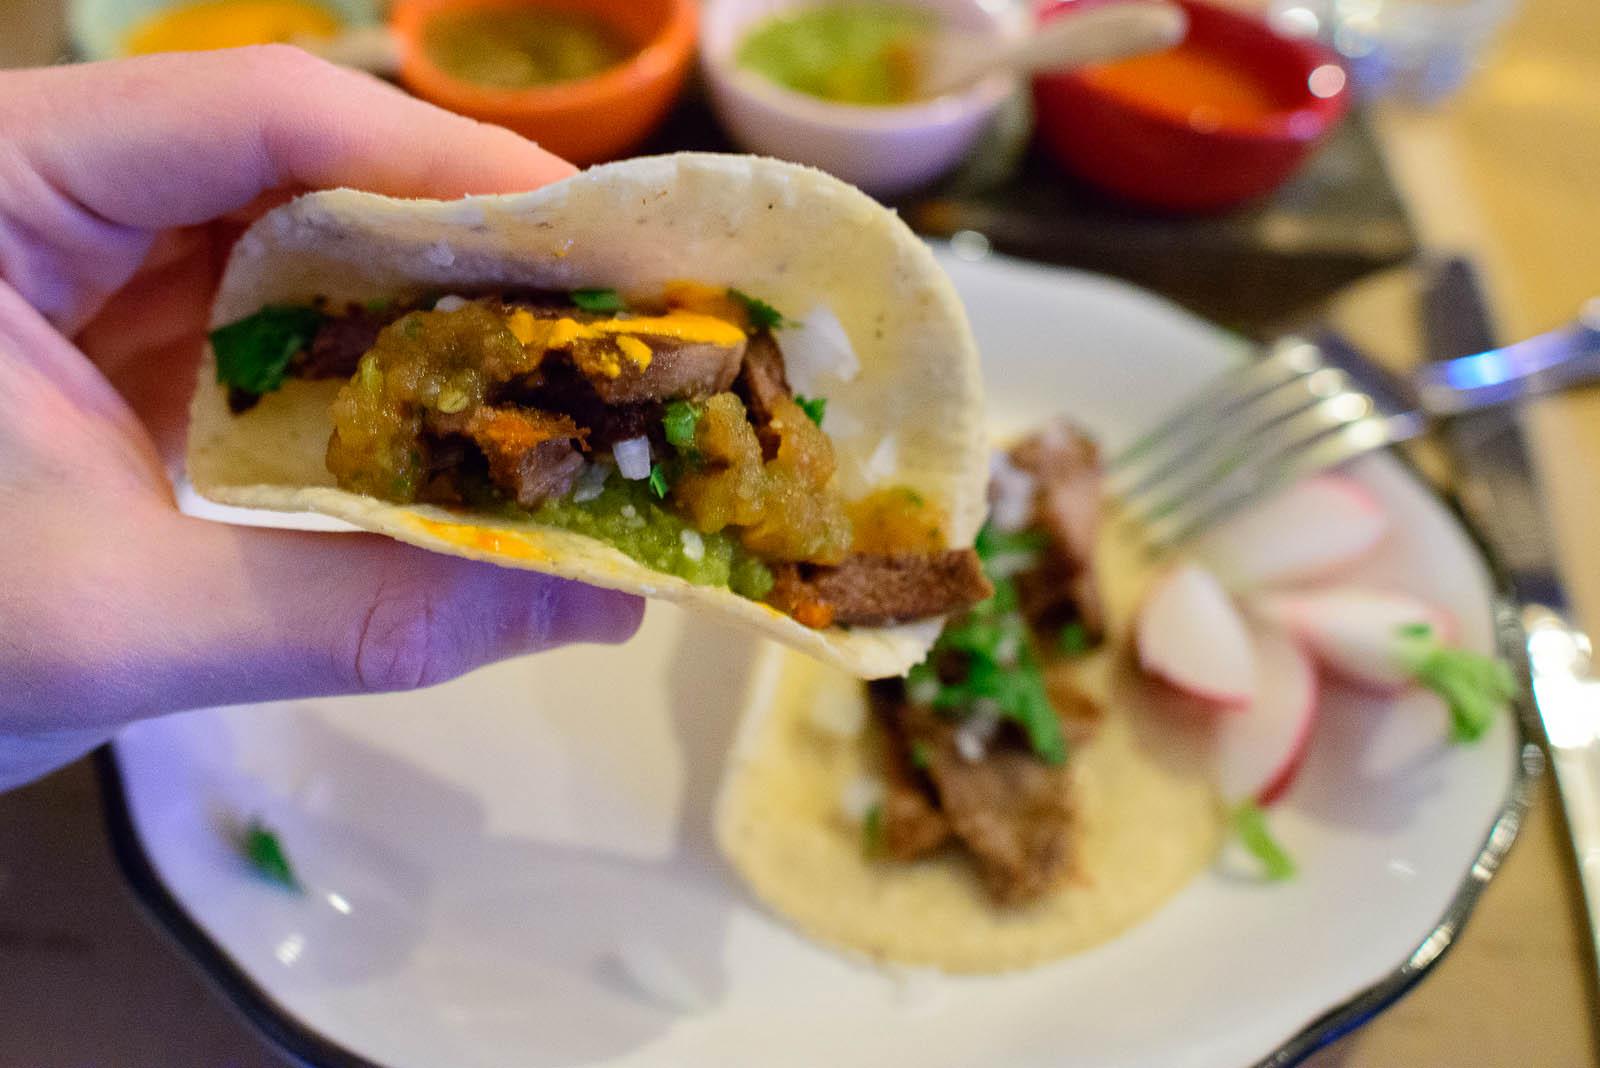 Taco de lengua (tongue), onion, cilantro, radish with salsas (se